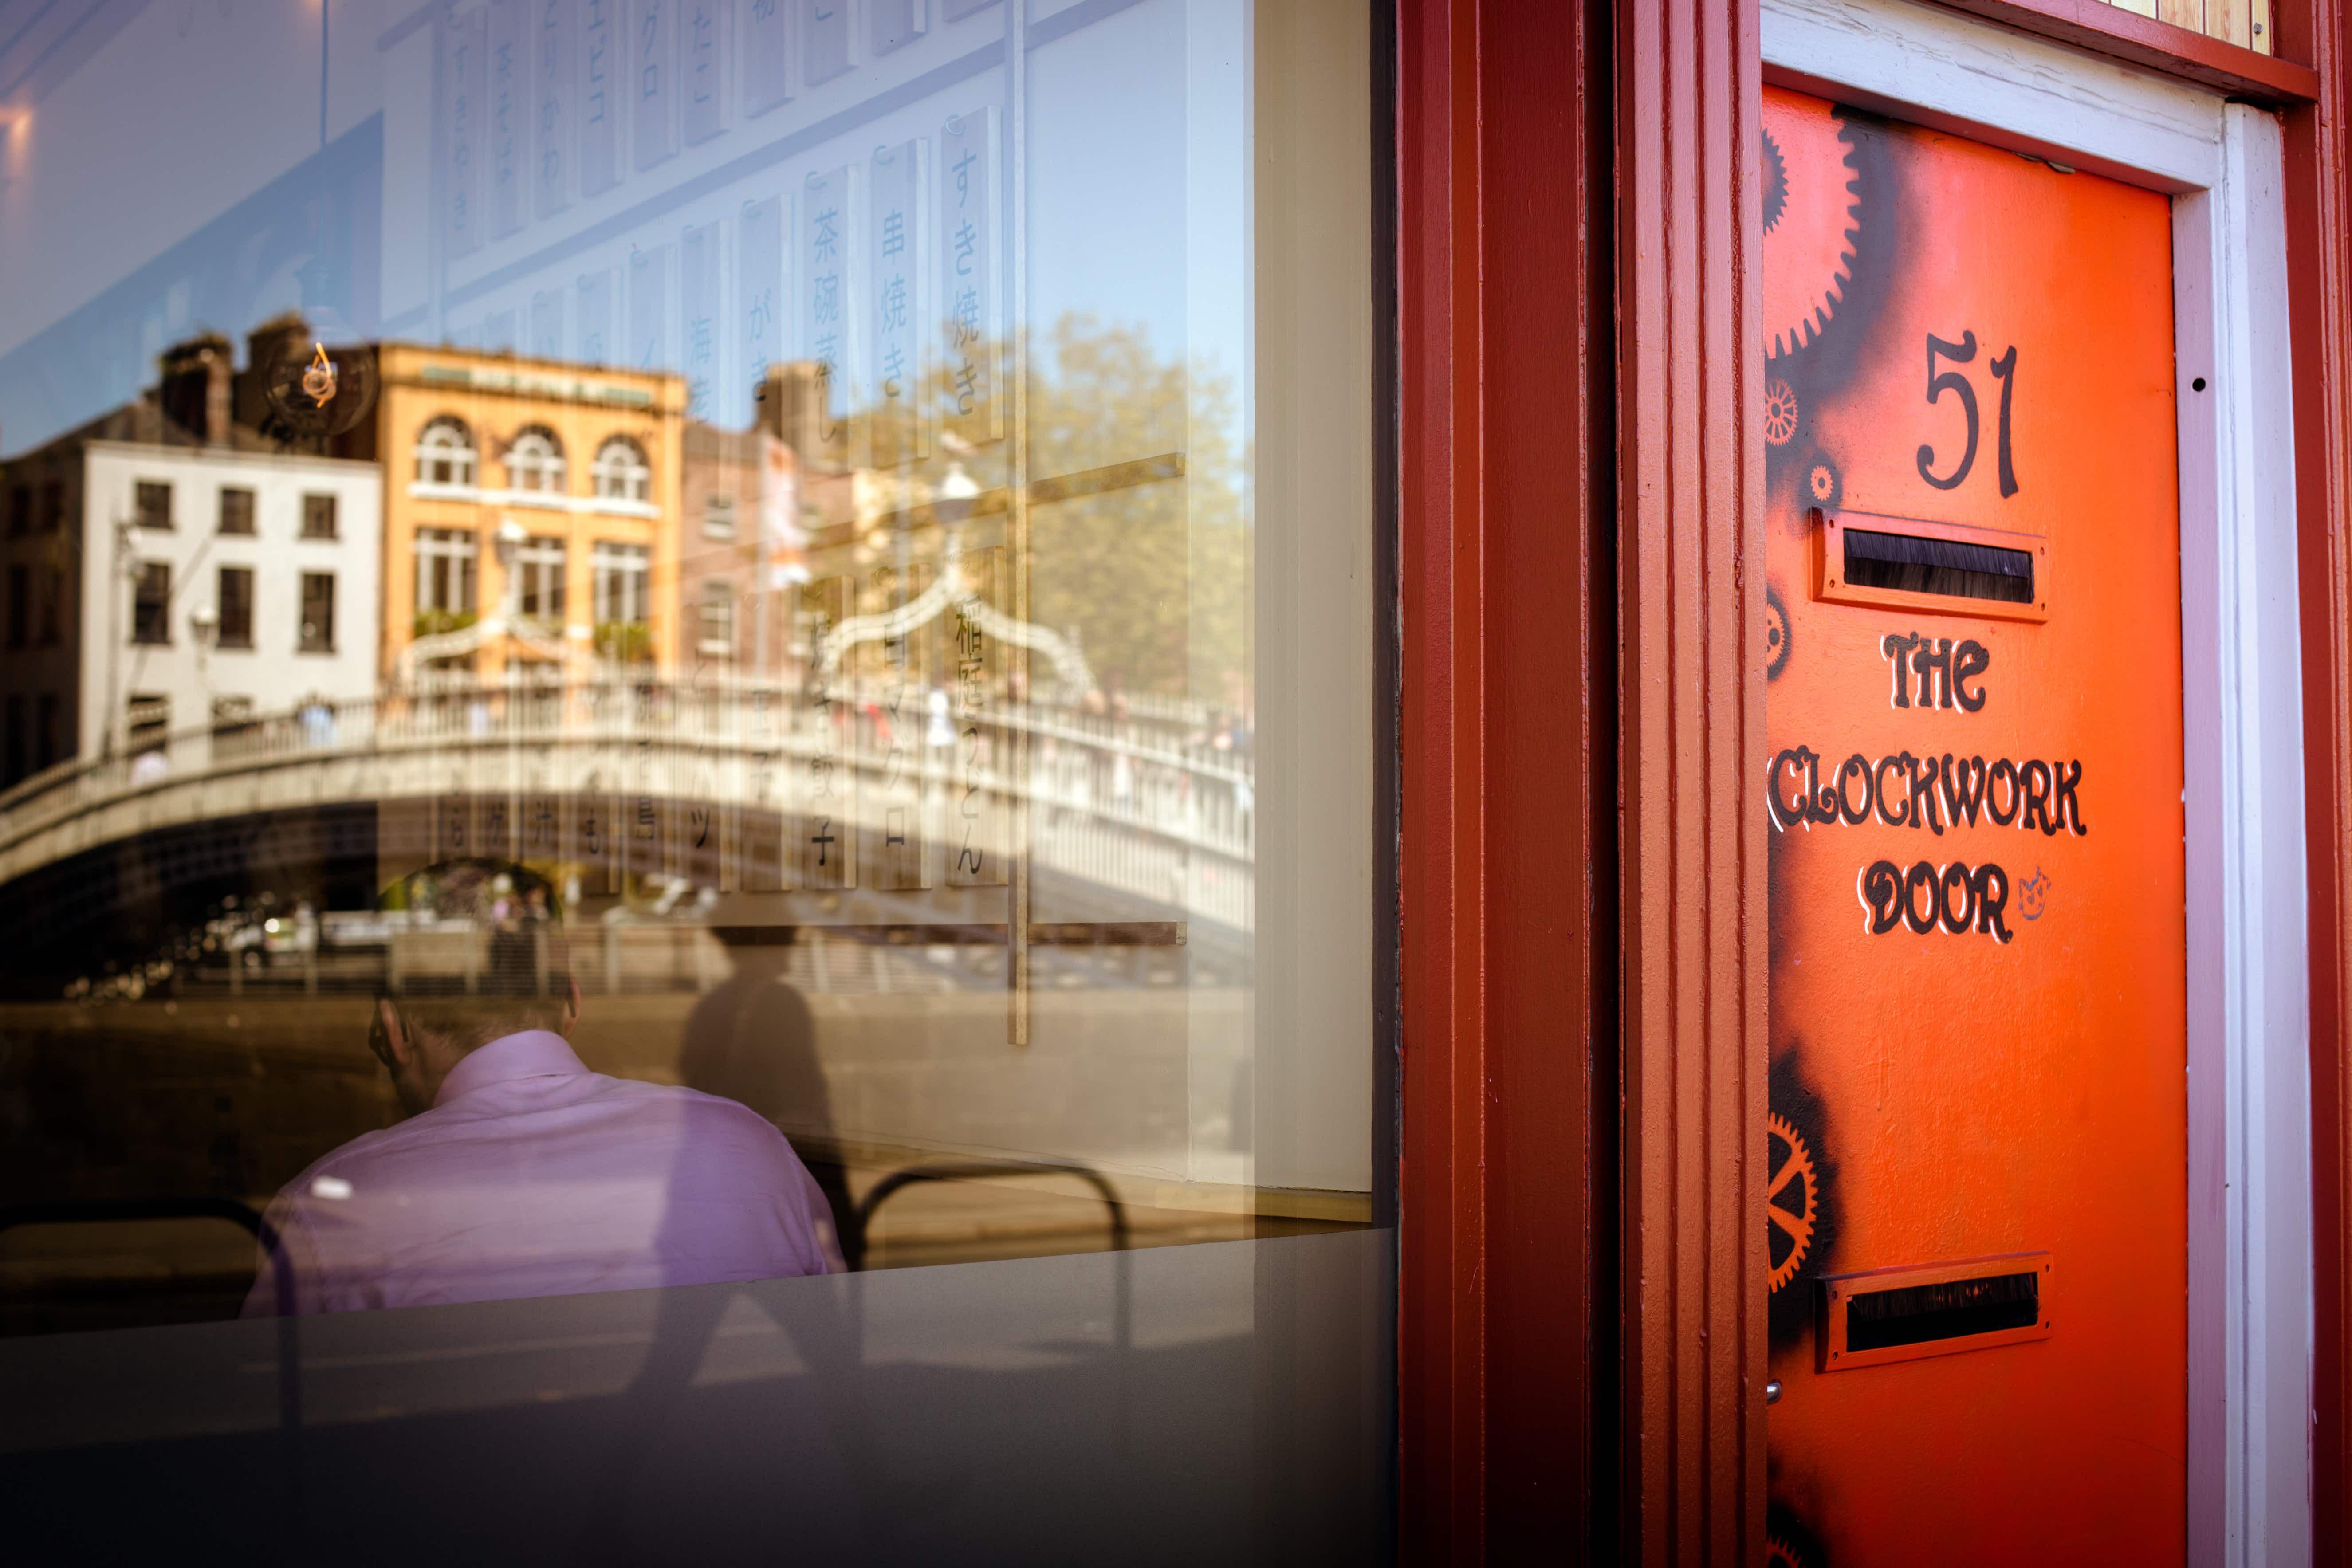 Is it a pub, is it a café? No, Dublin's latest venue is a 'time house' and visitors love it